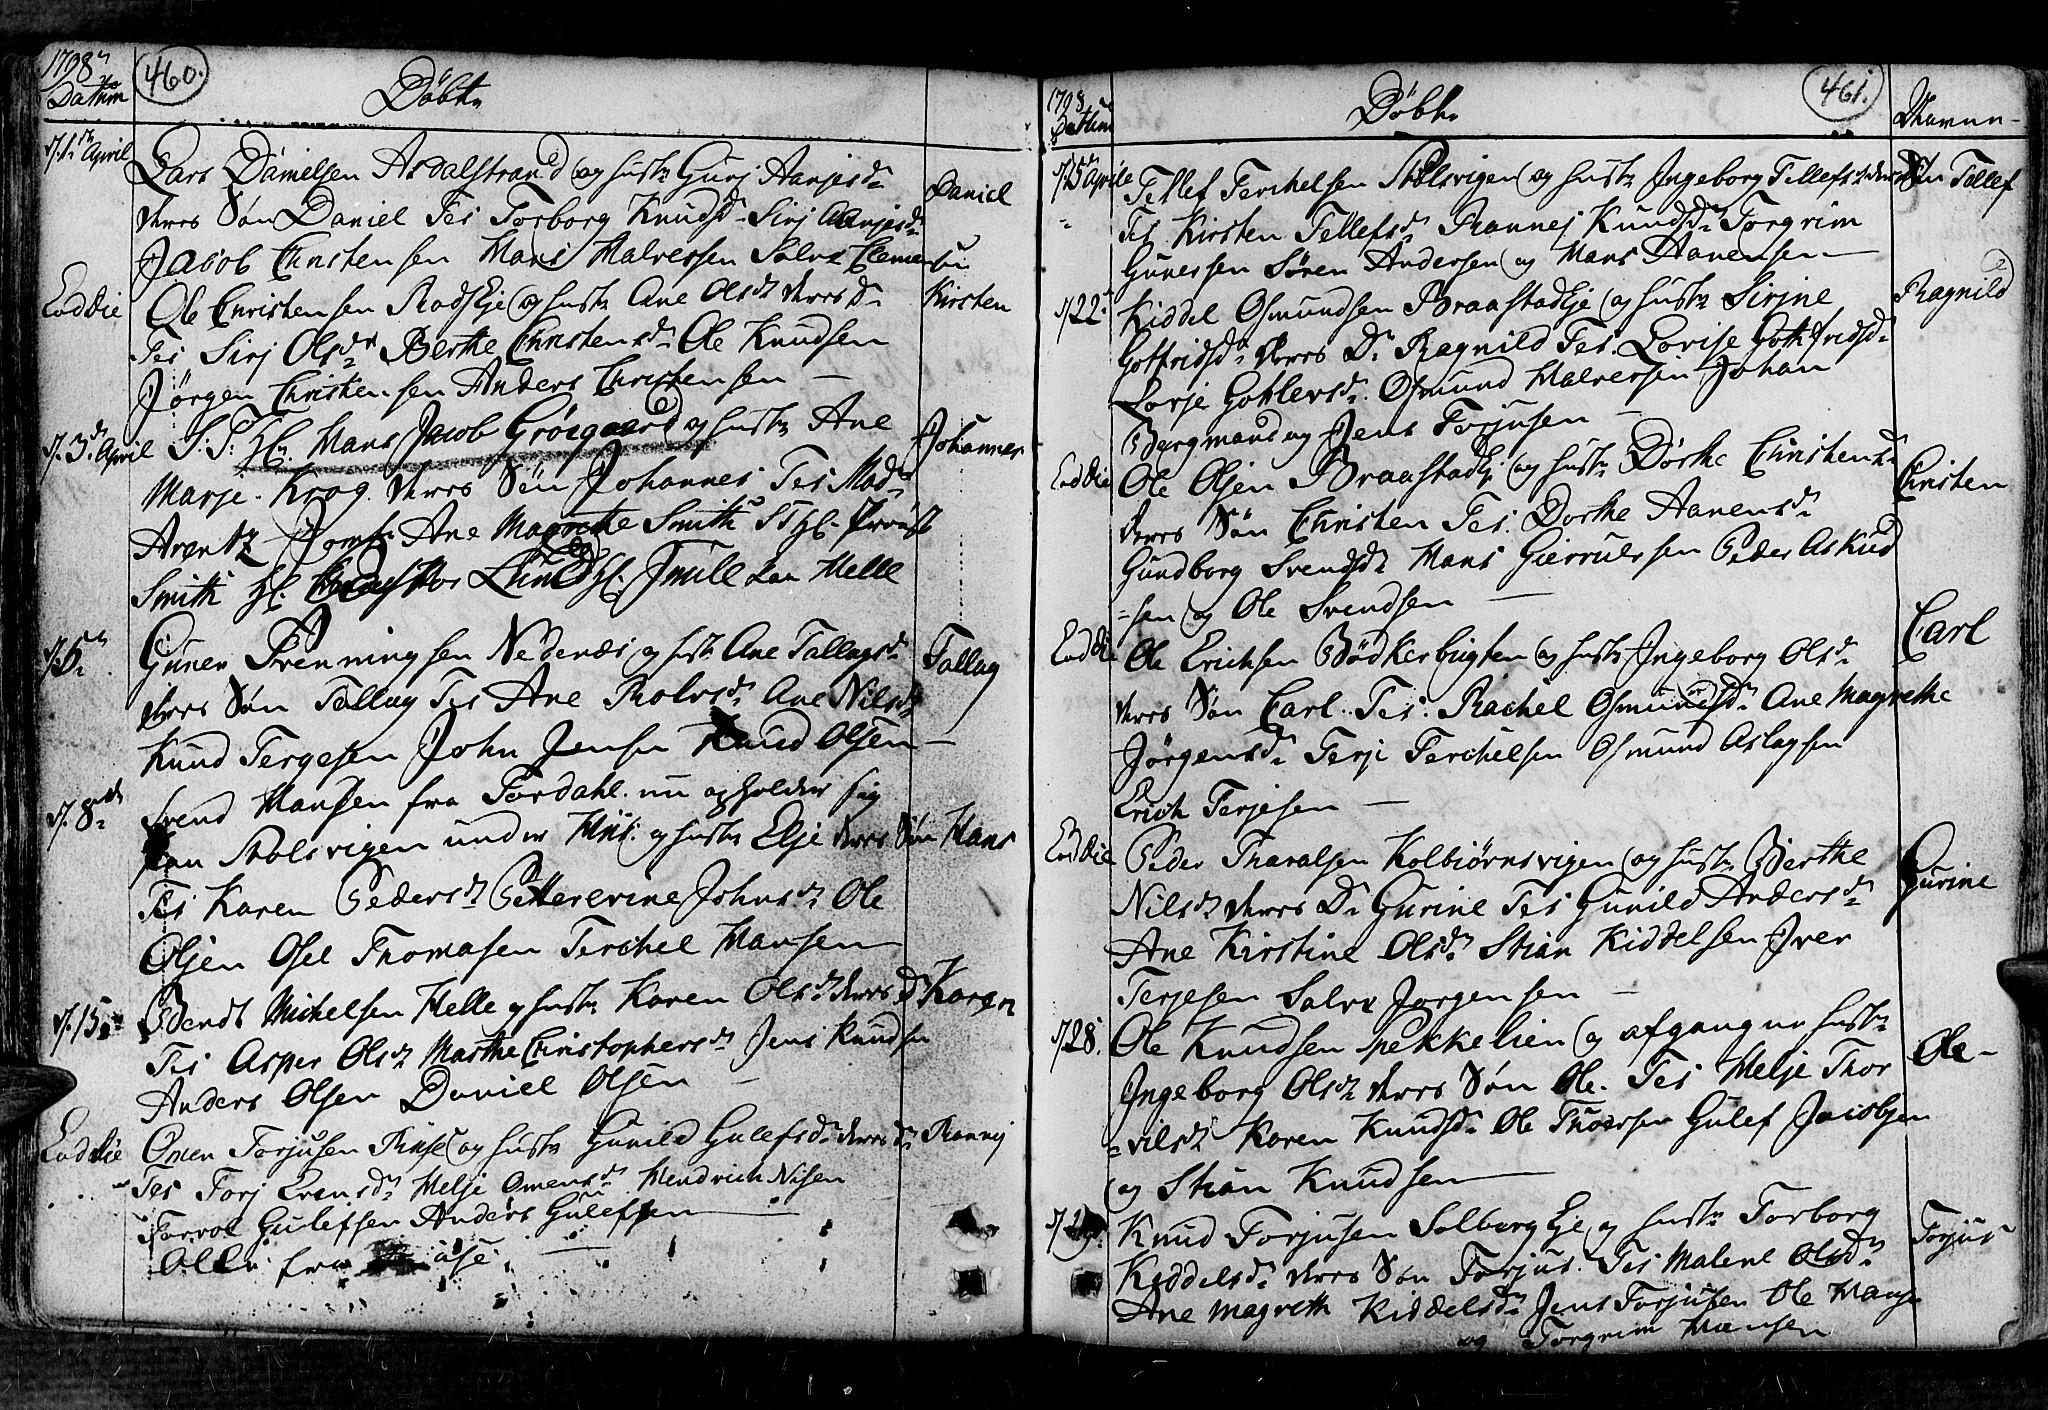 SAK, Øyestad sokneprestkontor, F/Fa/L0008: Ministerialbok nr. A 8, 1777-1804, s. 460-461